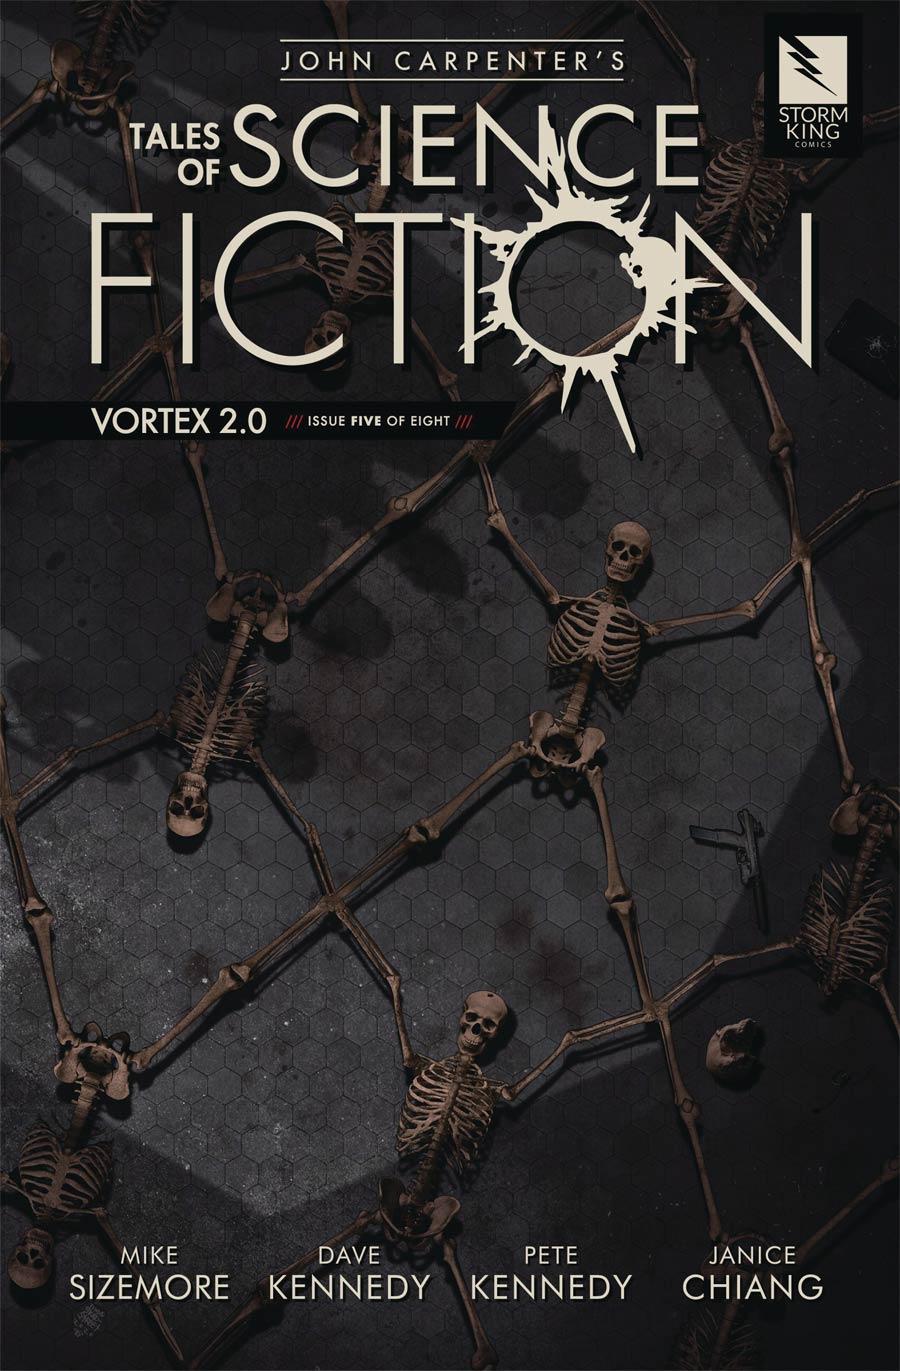 John Carpenters Tales Of Science Fiction Vortex 2.0 #5